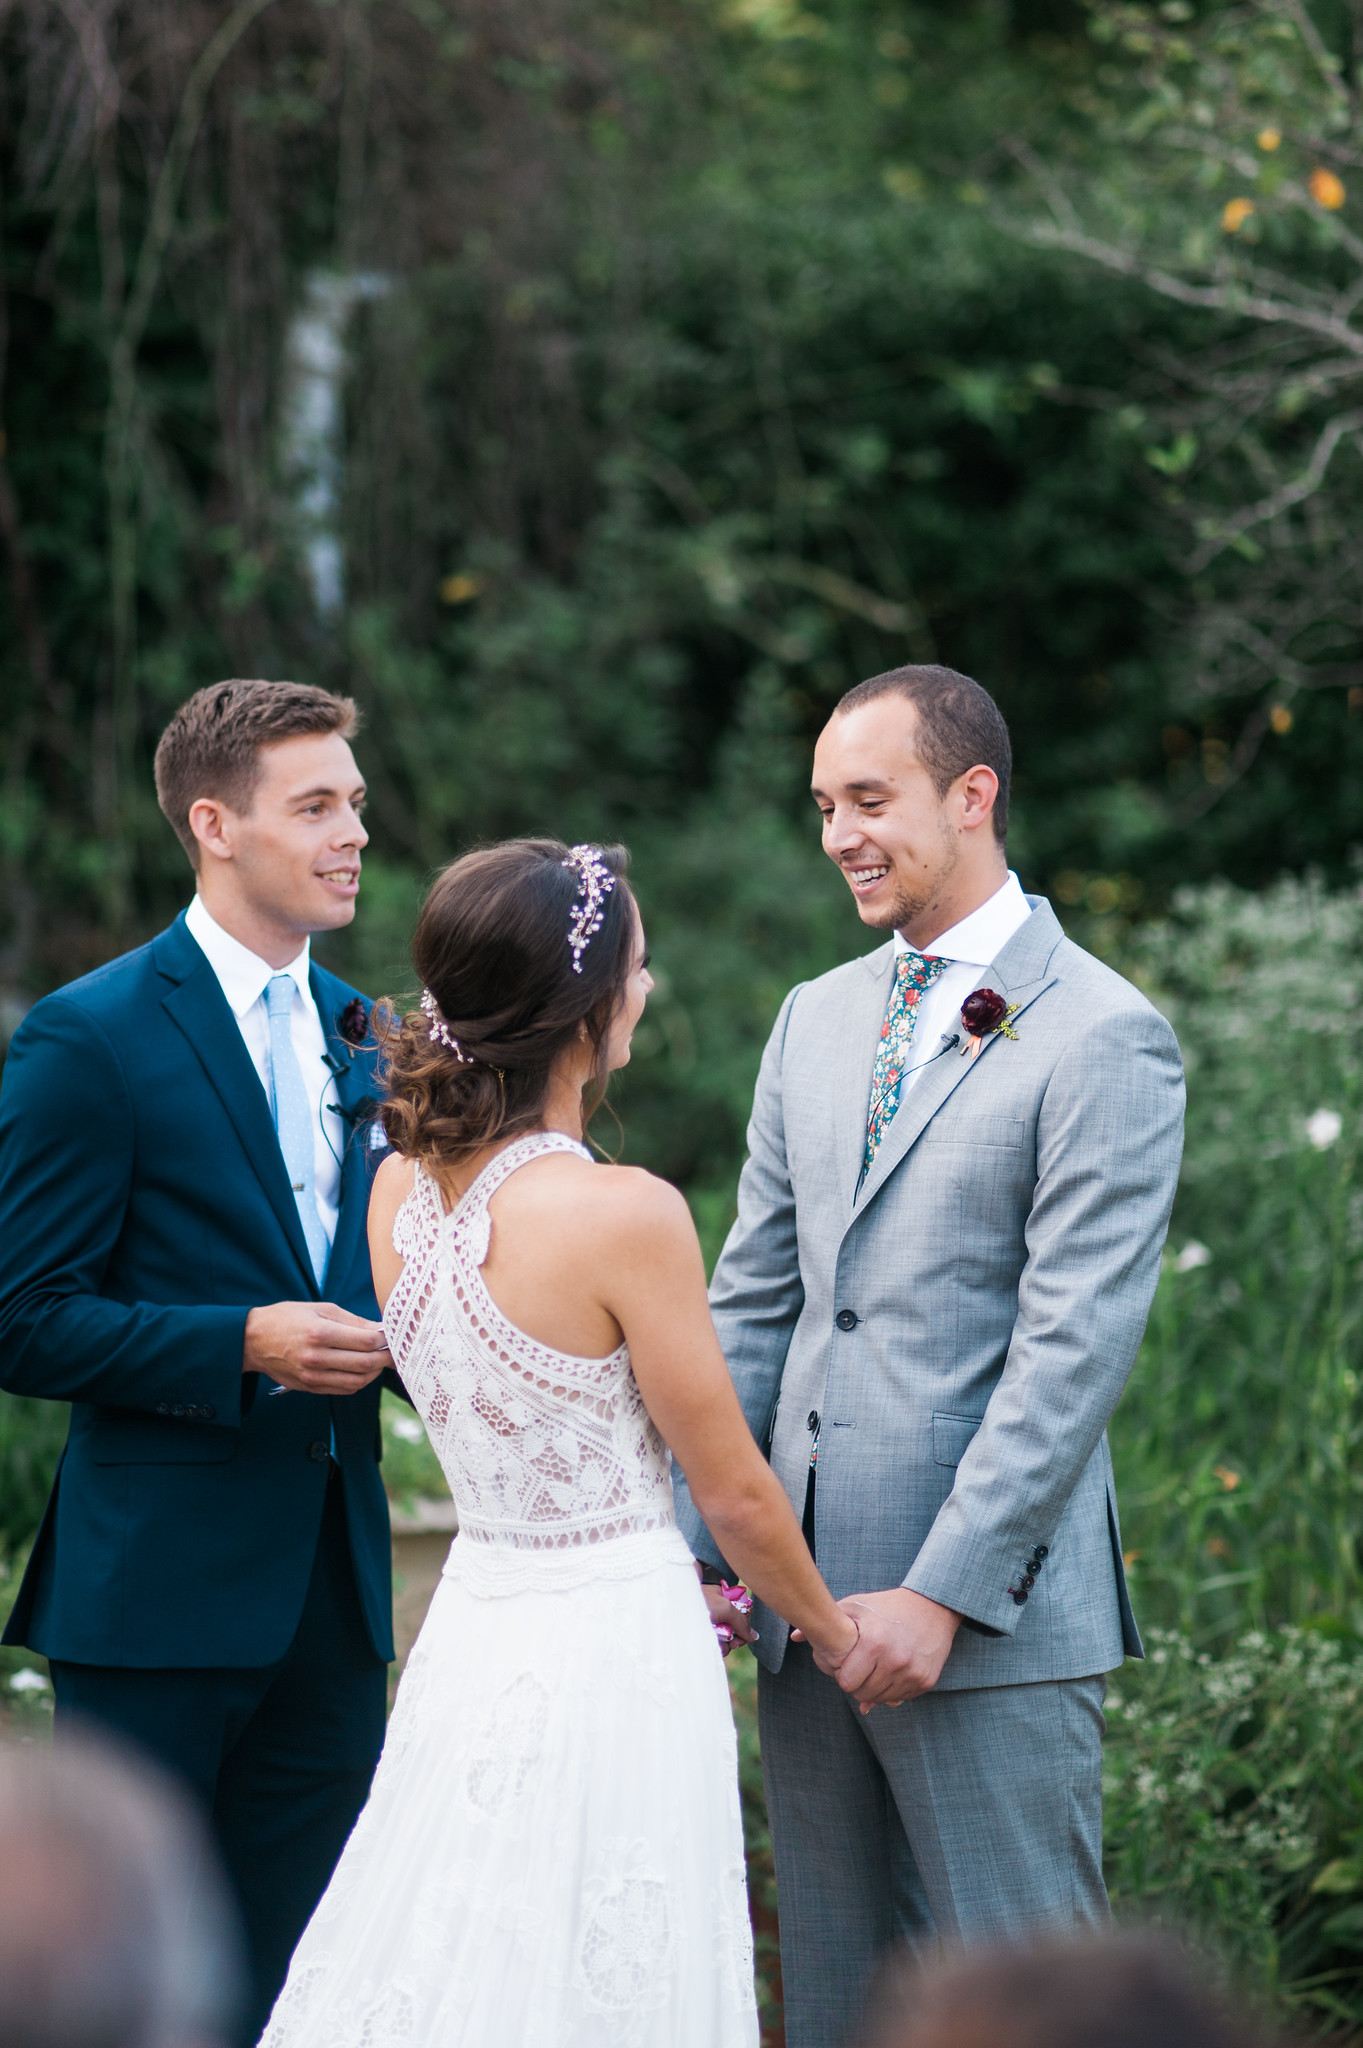 thomas-wedding-178-X4.jpg